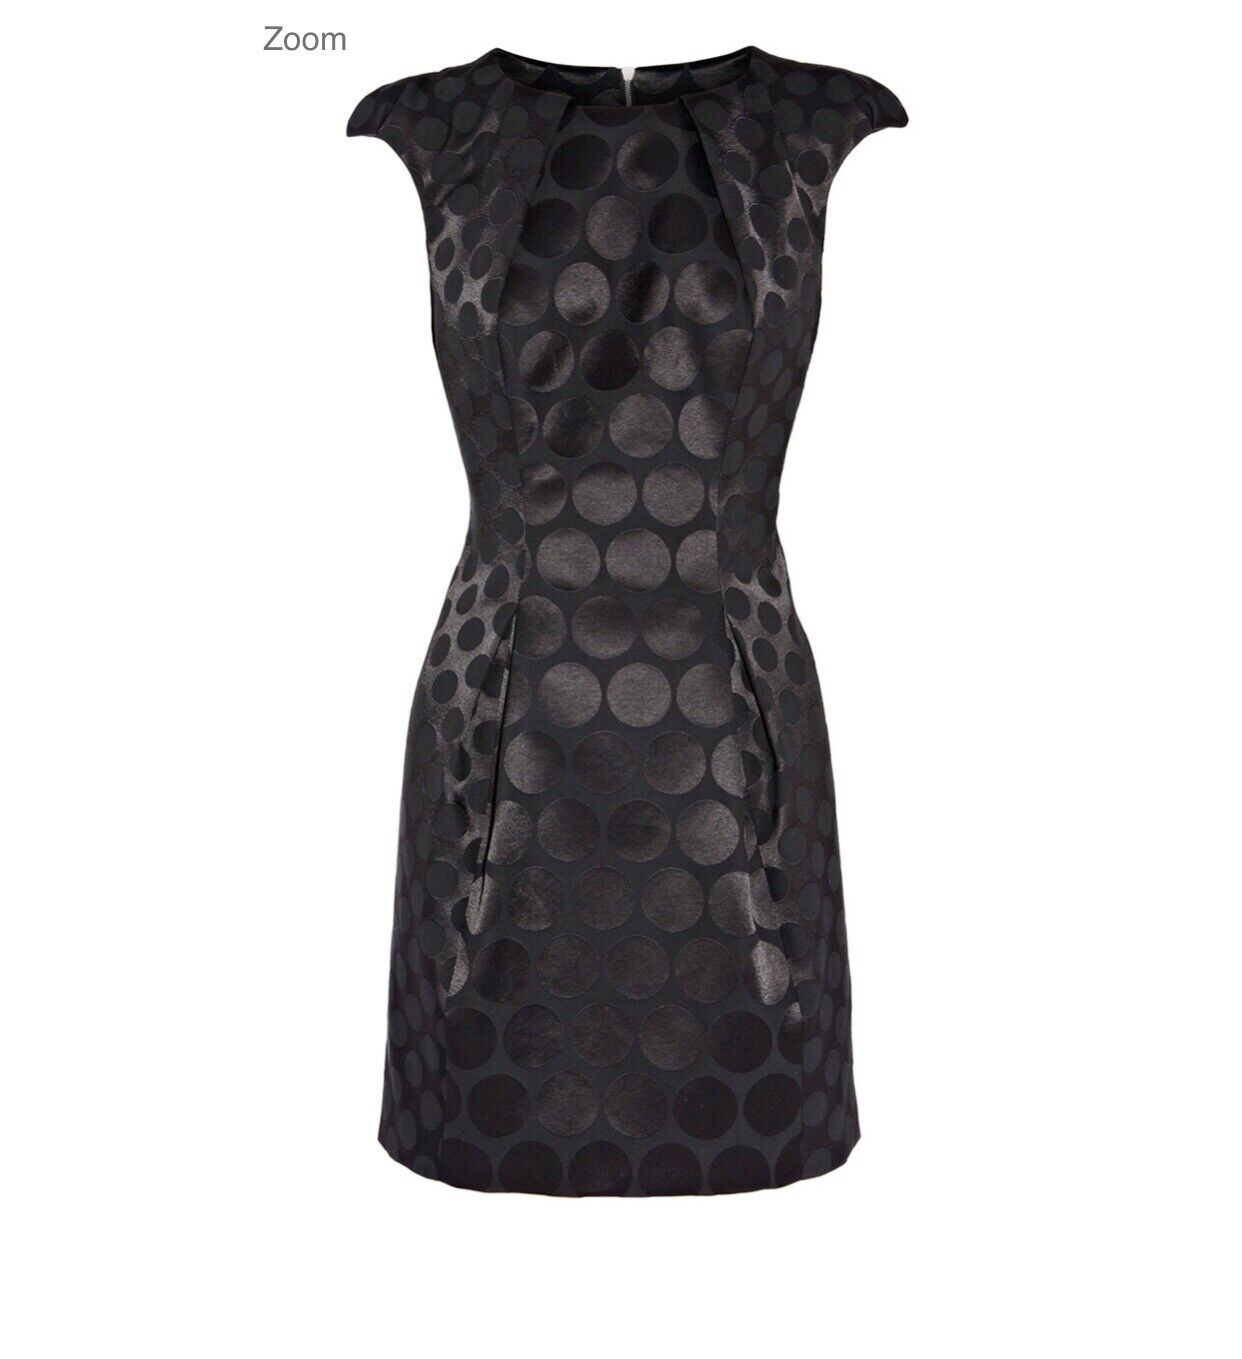 Karen Millem lunares de Jacquard  Negro Vestido Talla 10  tiendas minoristas